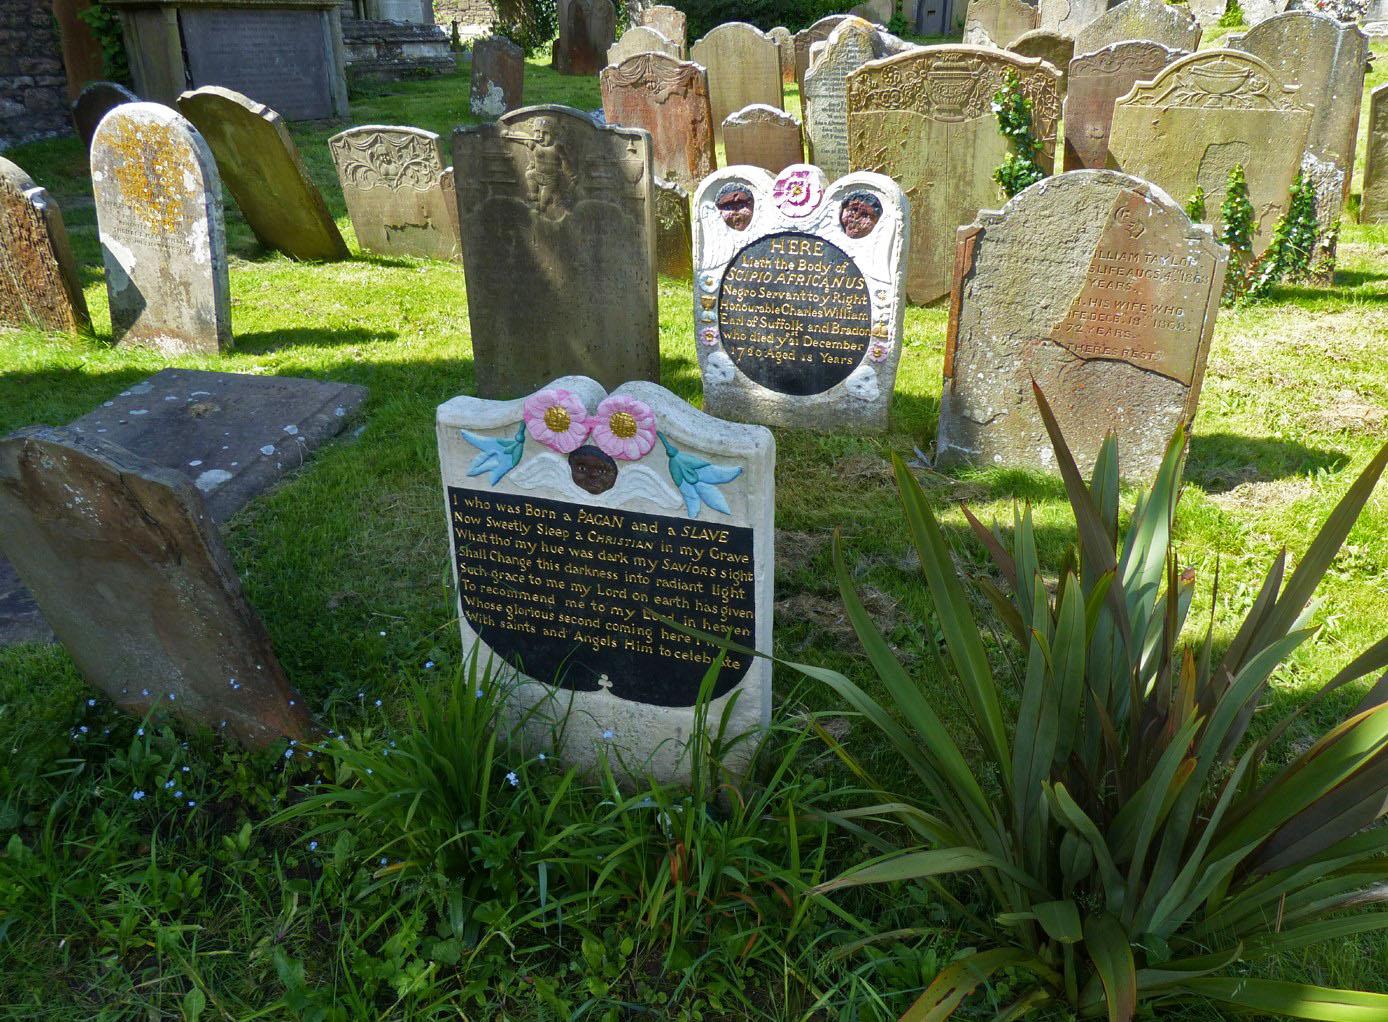 File:Scipio Africanus grave Henbury Bristol England arp.jpg - Wikimedia Commons